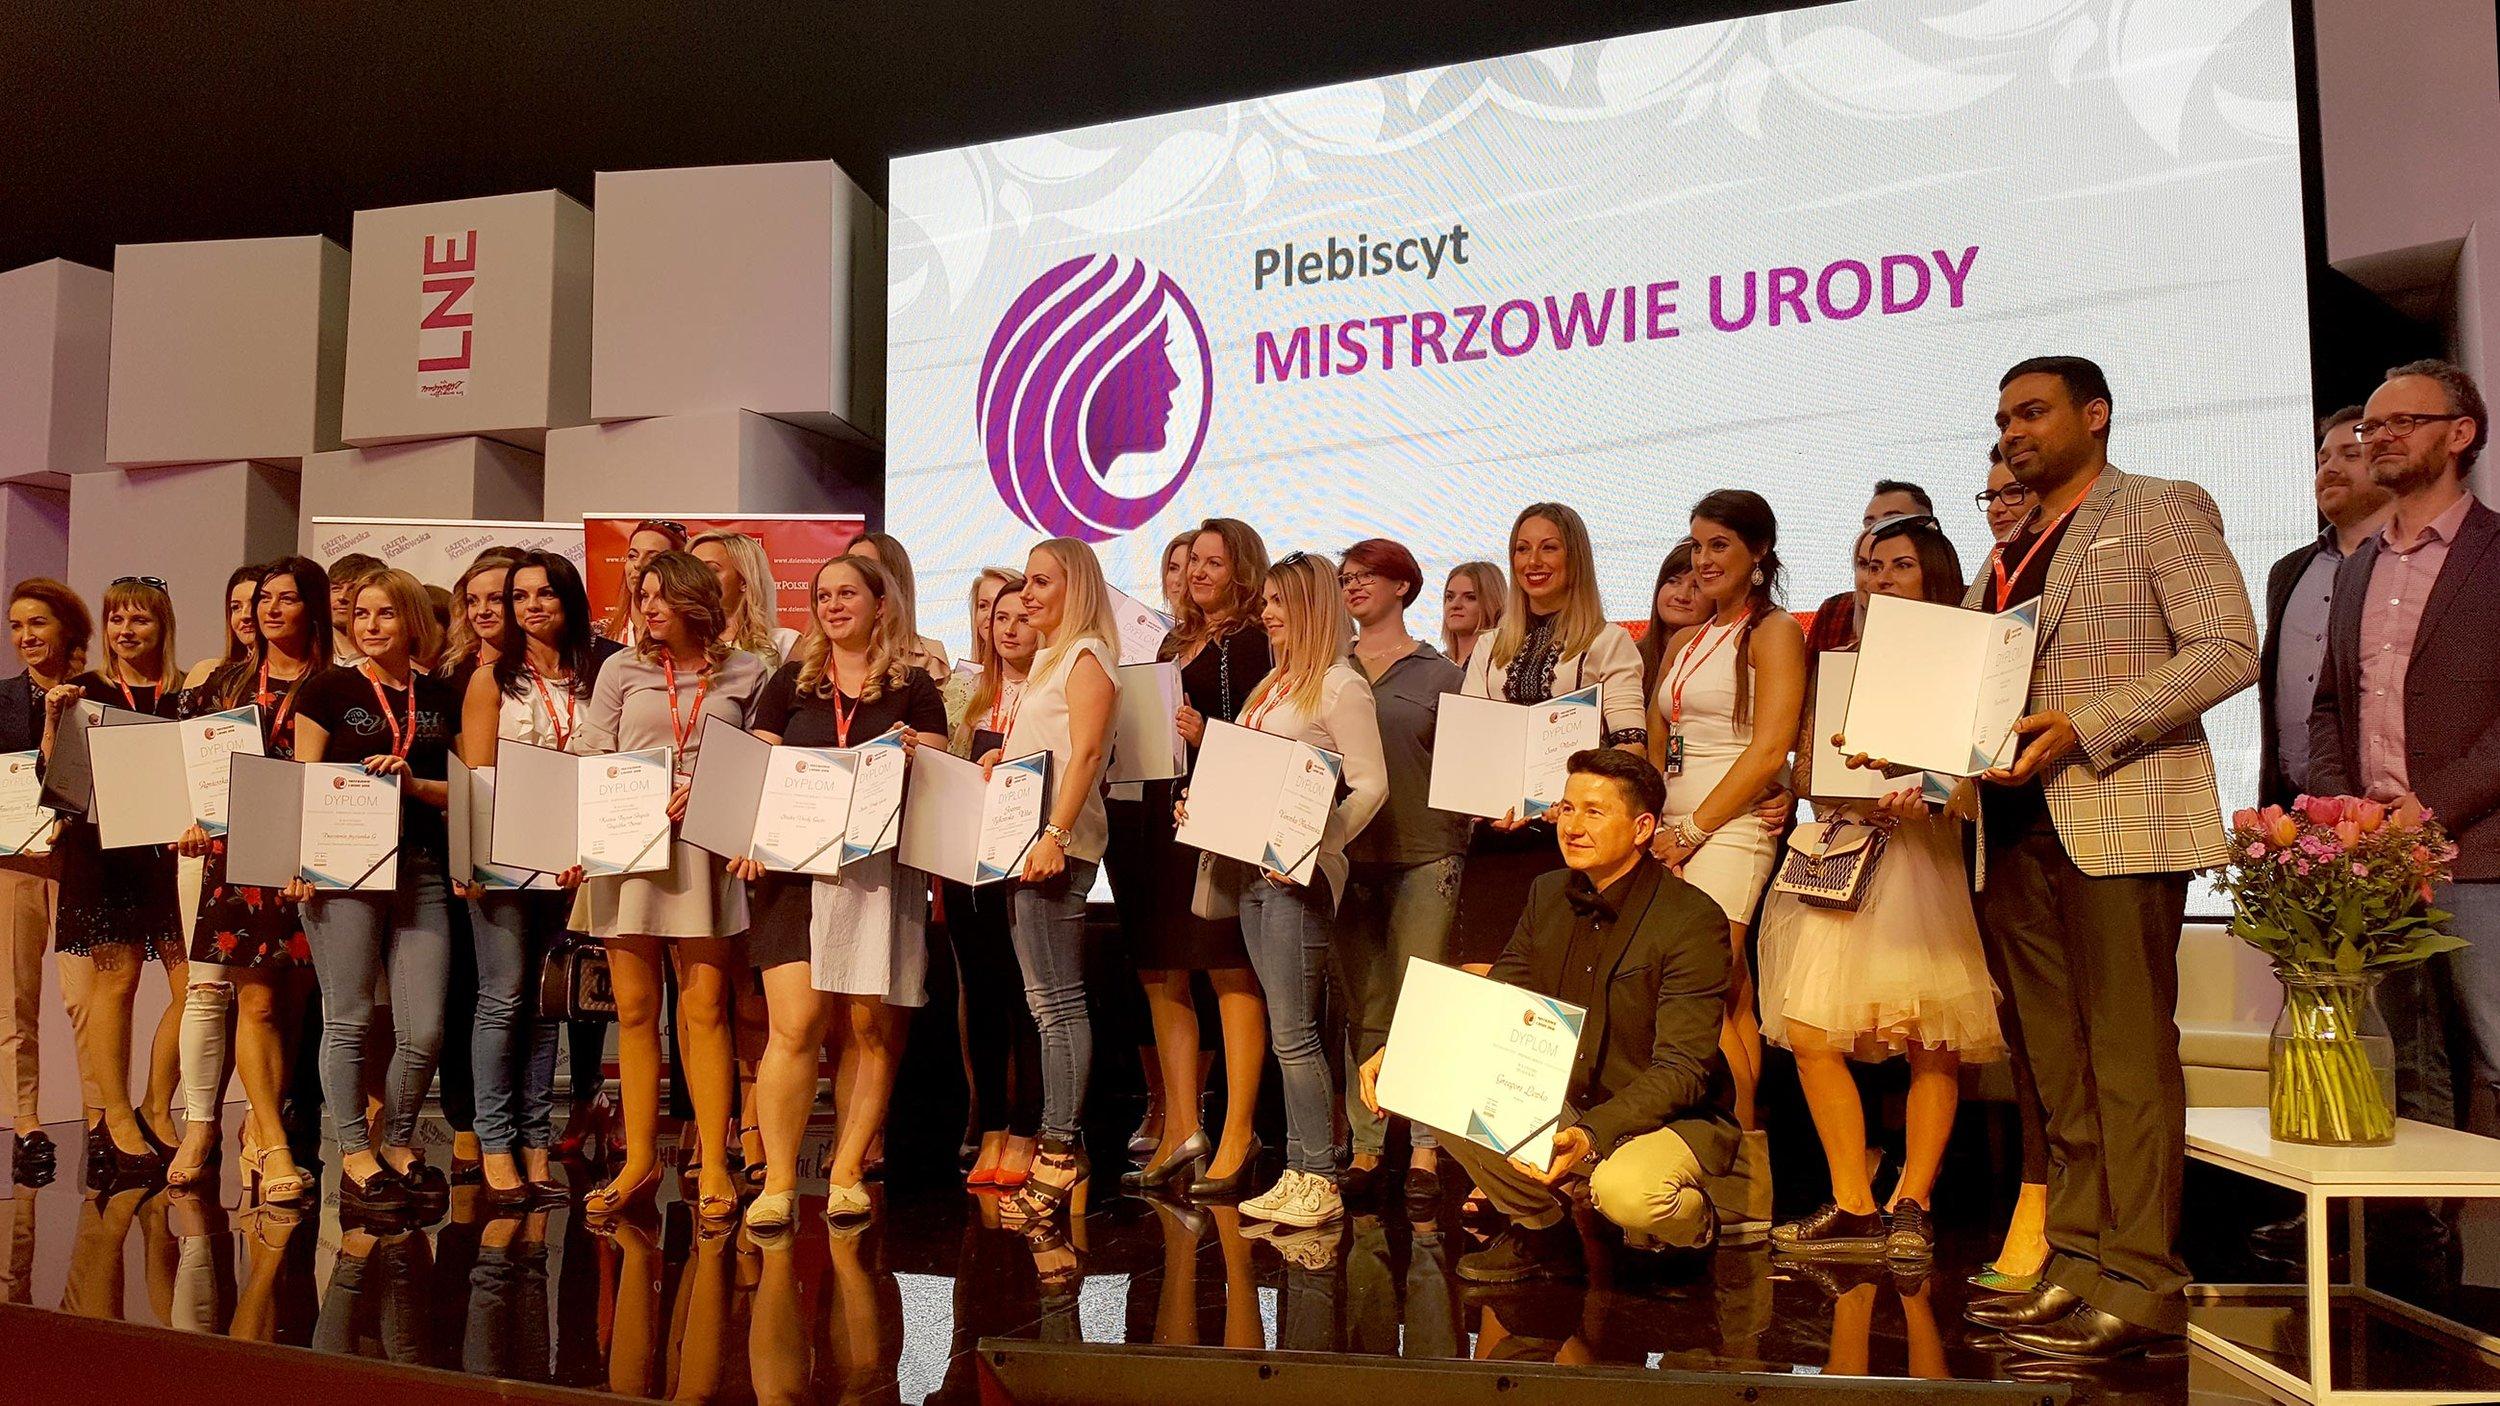 1-keraoriental-gazeta-spa-roku-2018-krakow.jpg